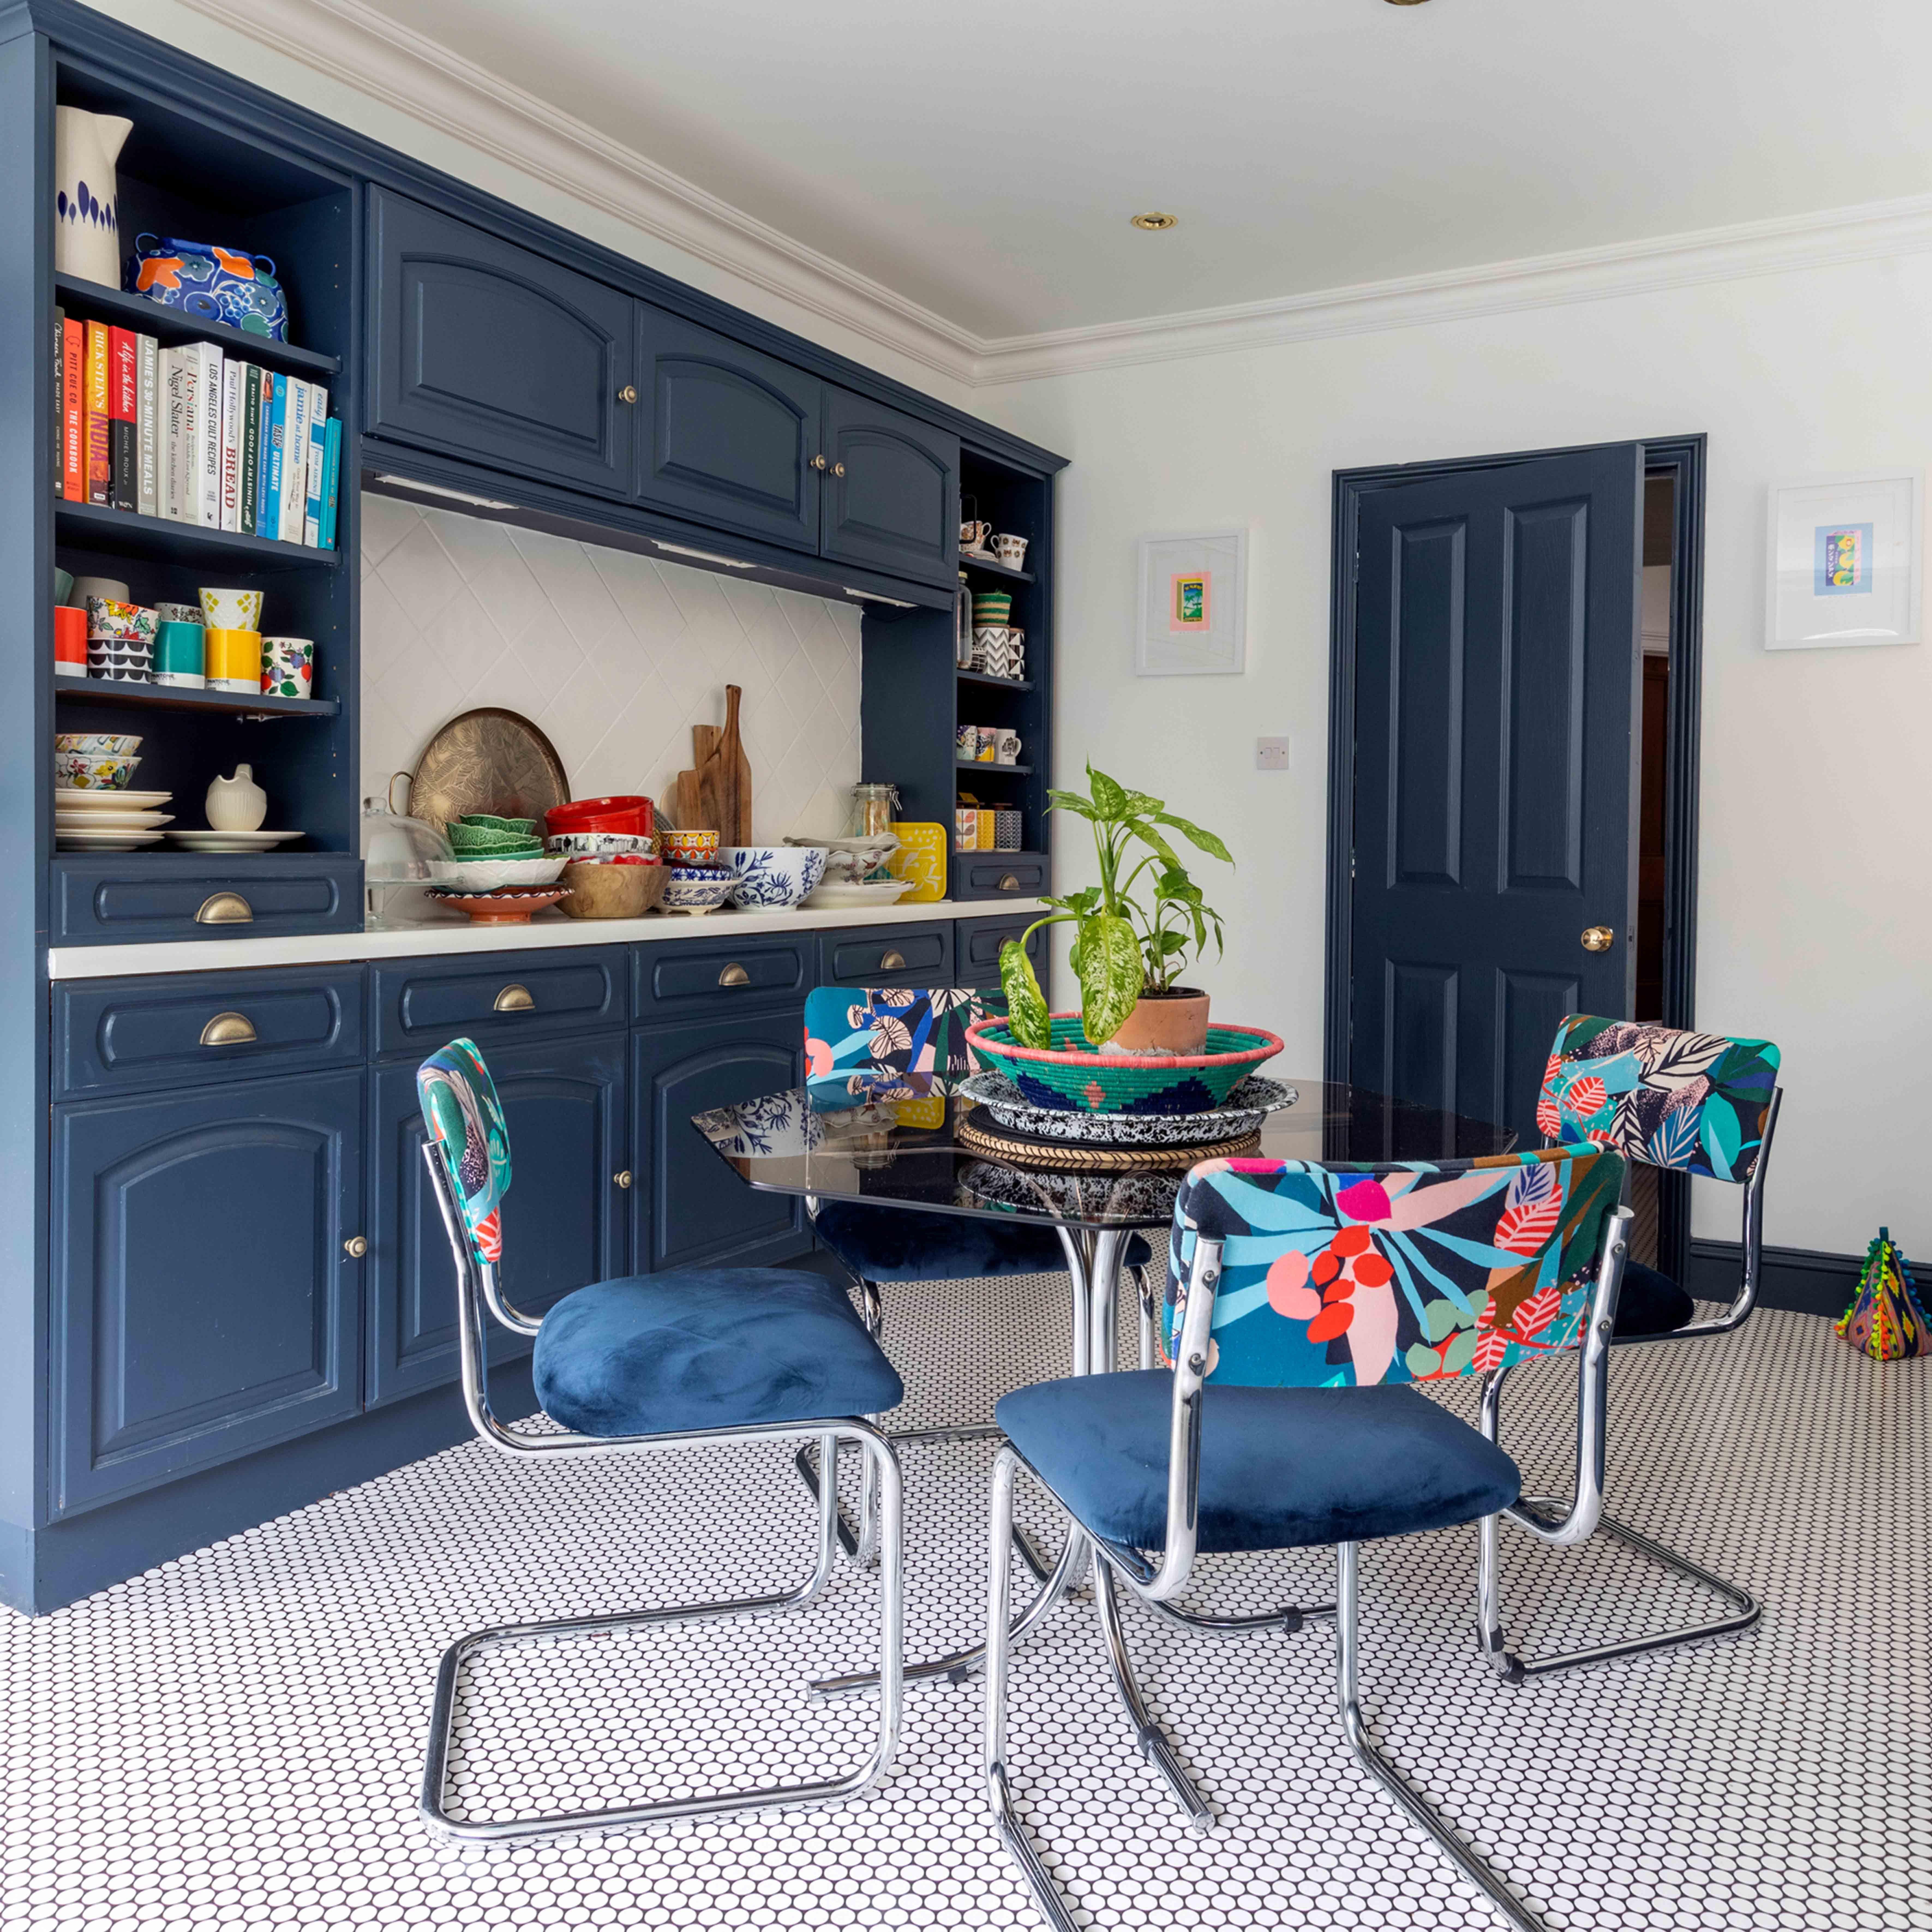 Creating A Forever Home in Kent, England Design*Sponge